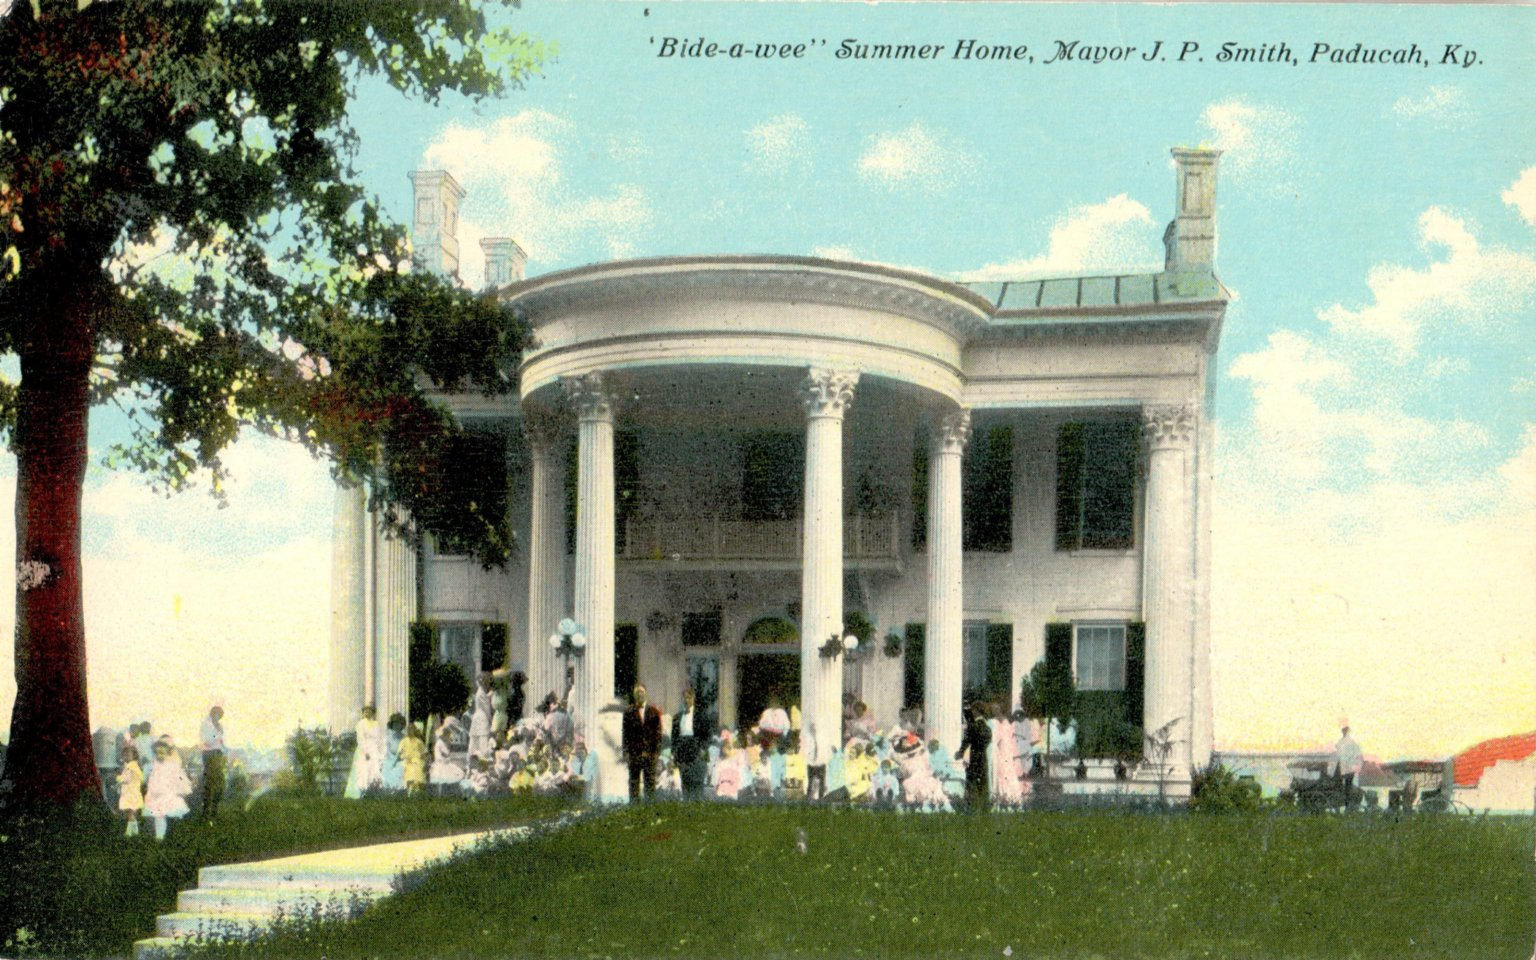 "Bide-a-wee"" Summer Home, Mayor J. P. Smith, Paducah, Ky."